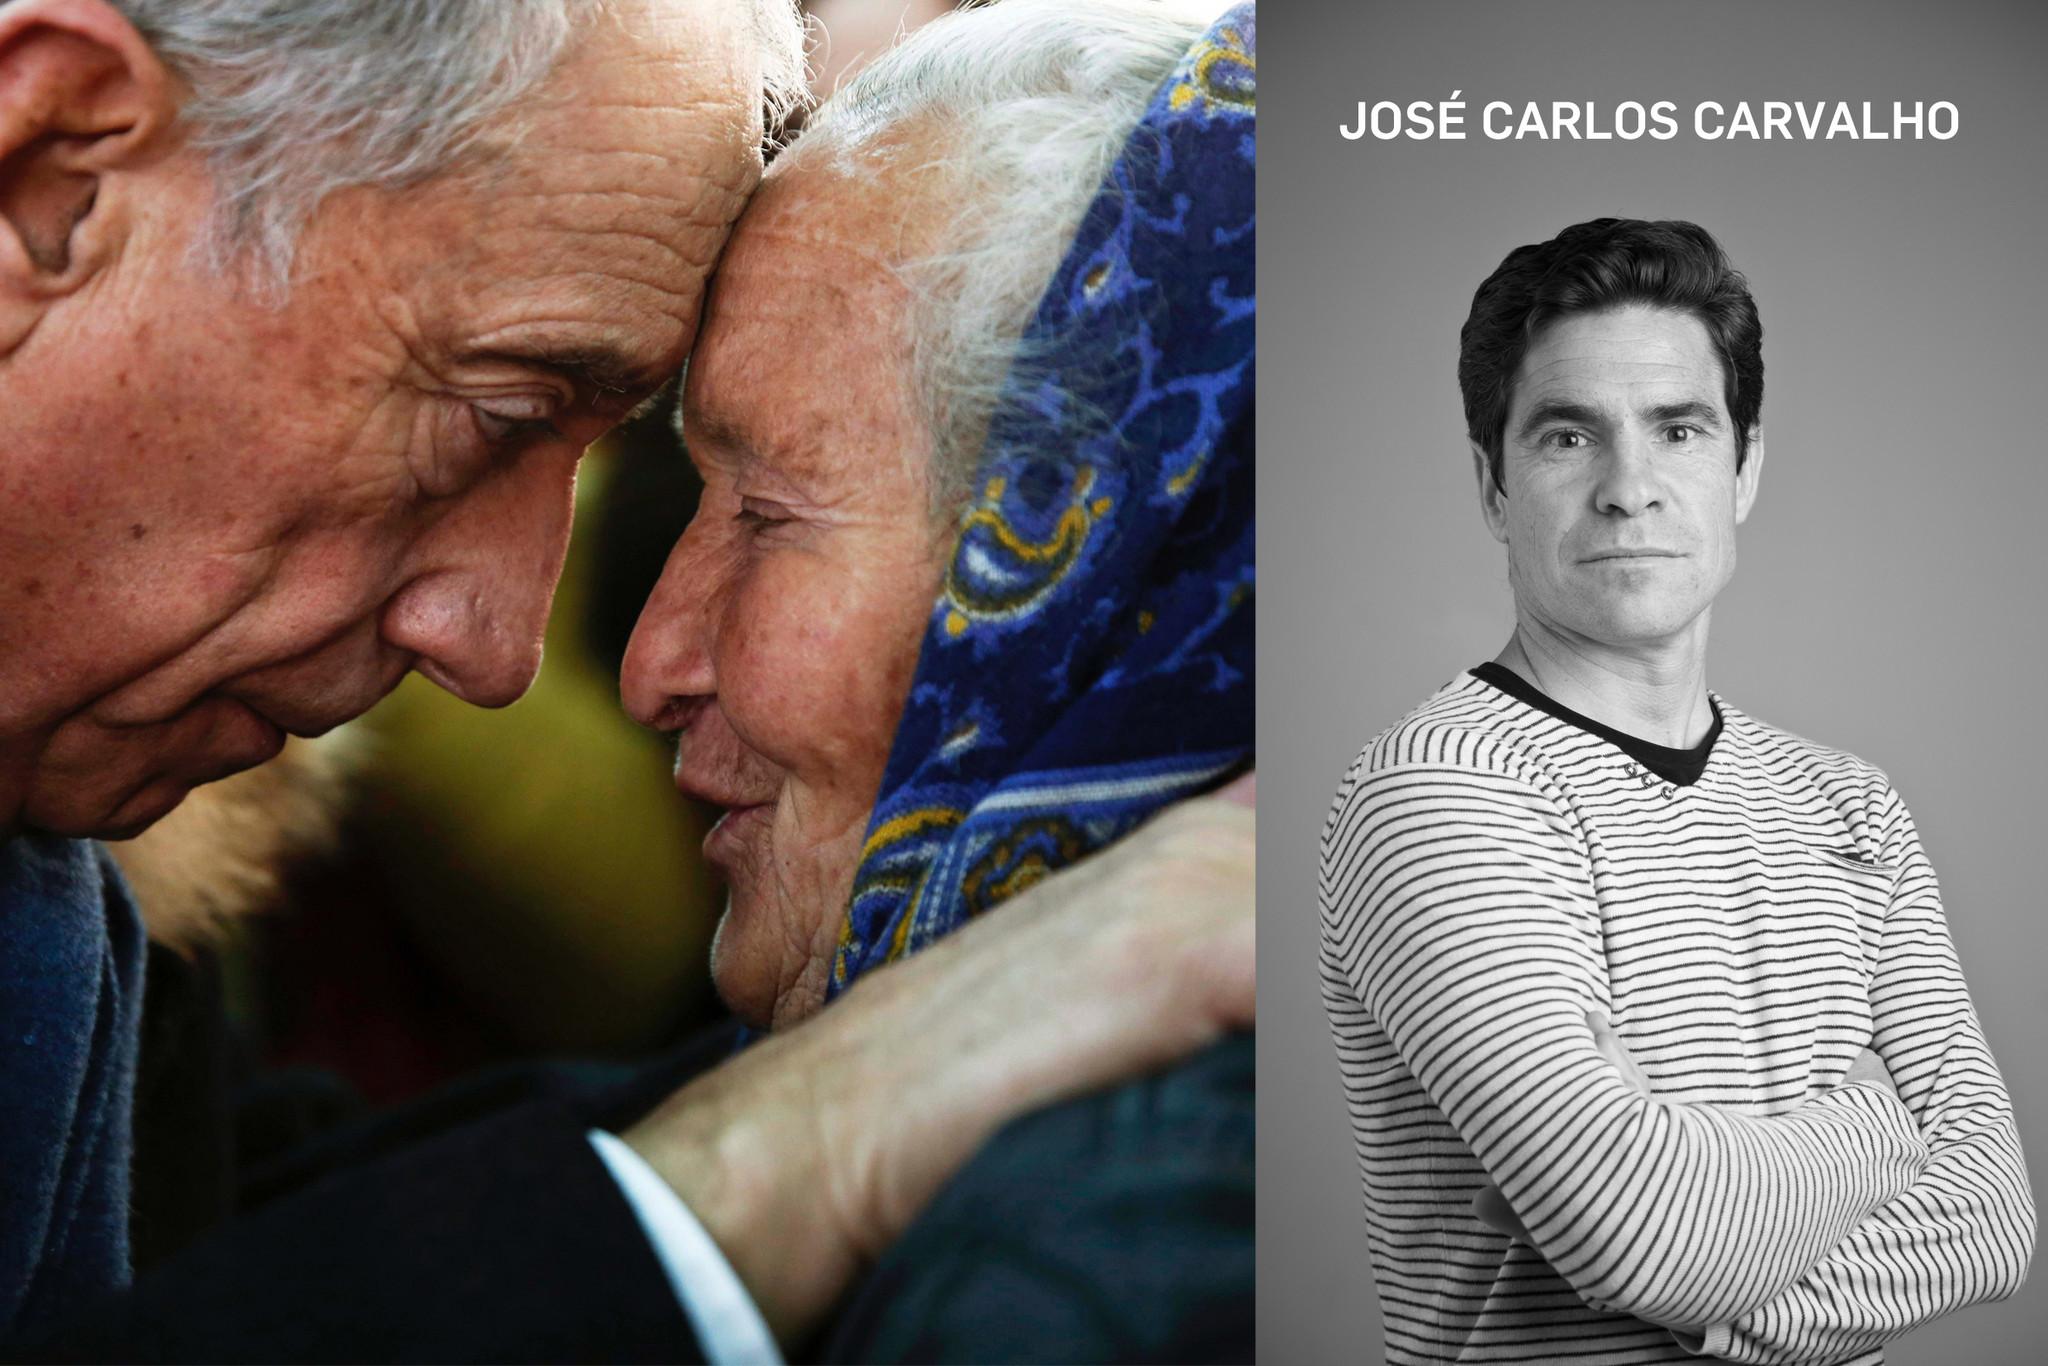 Jose Carlos WPP meme_edited-1.jpg